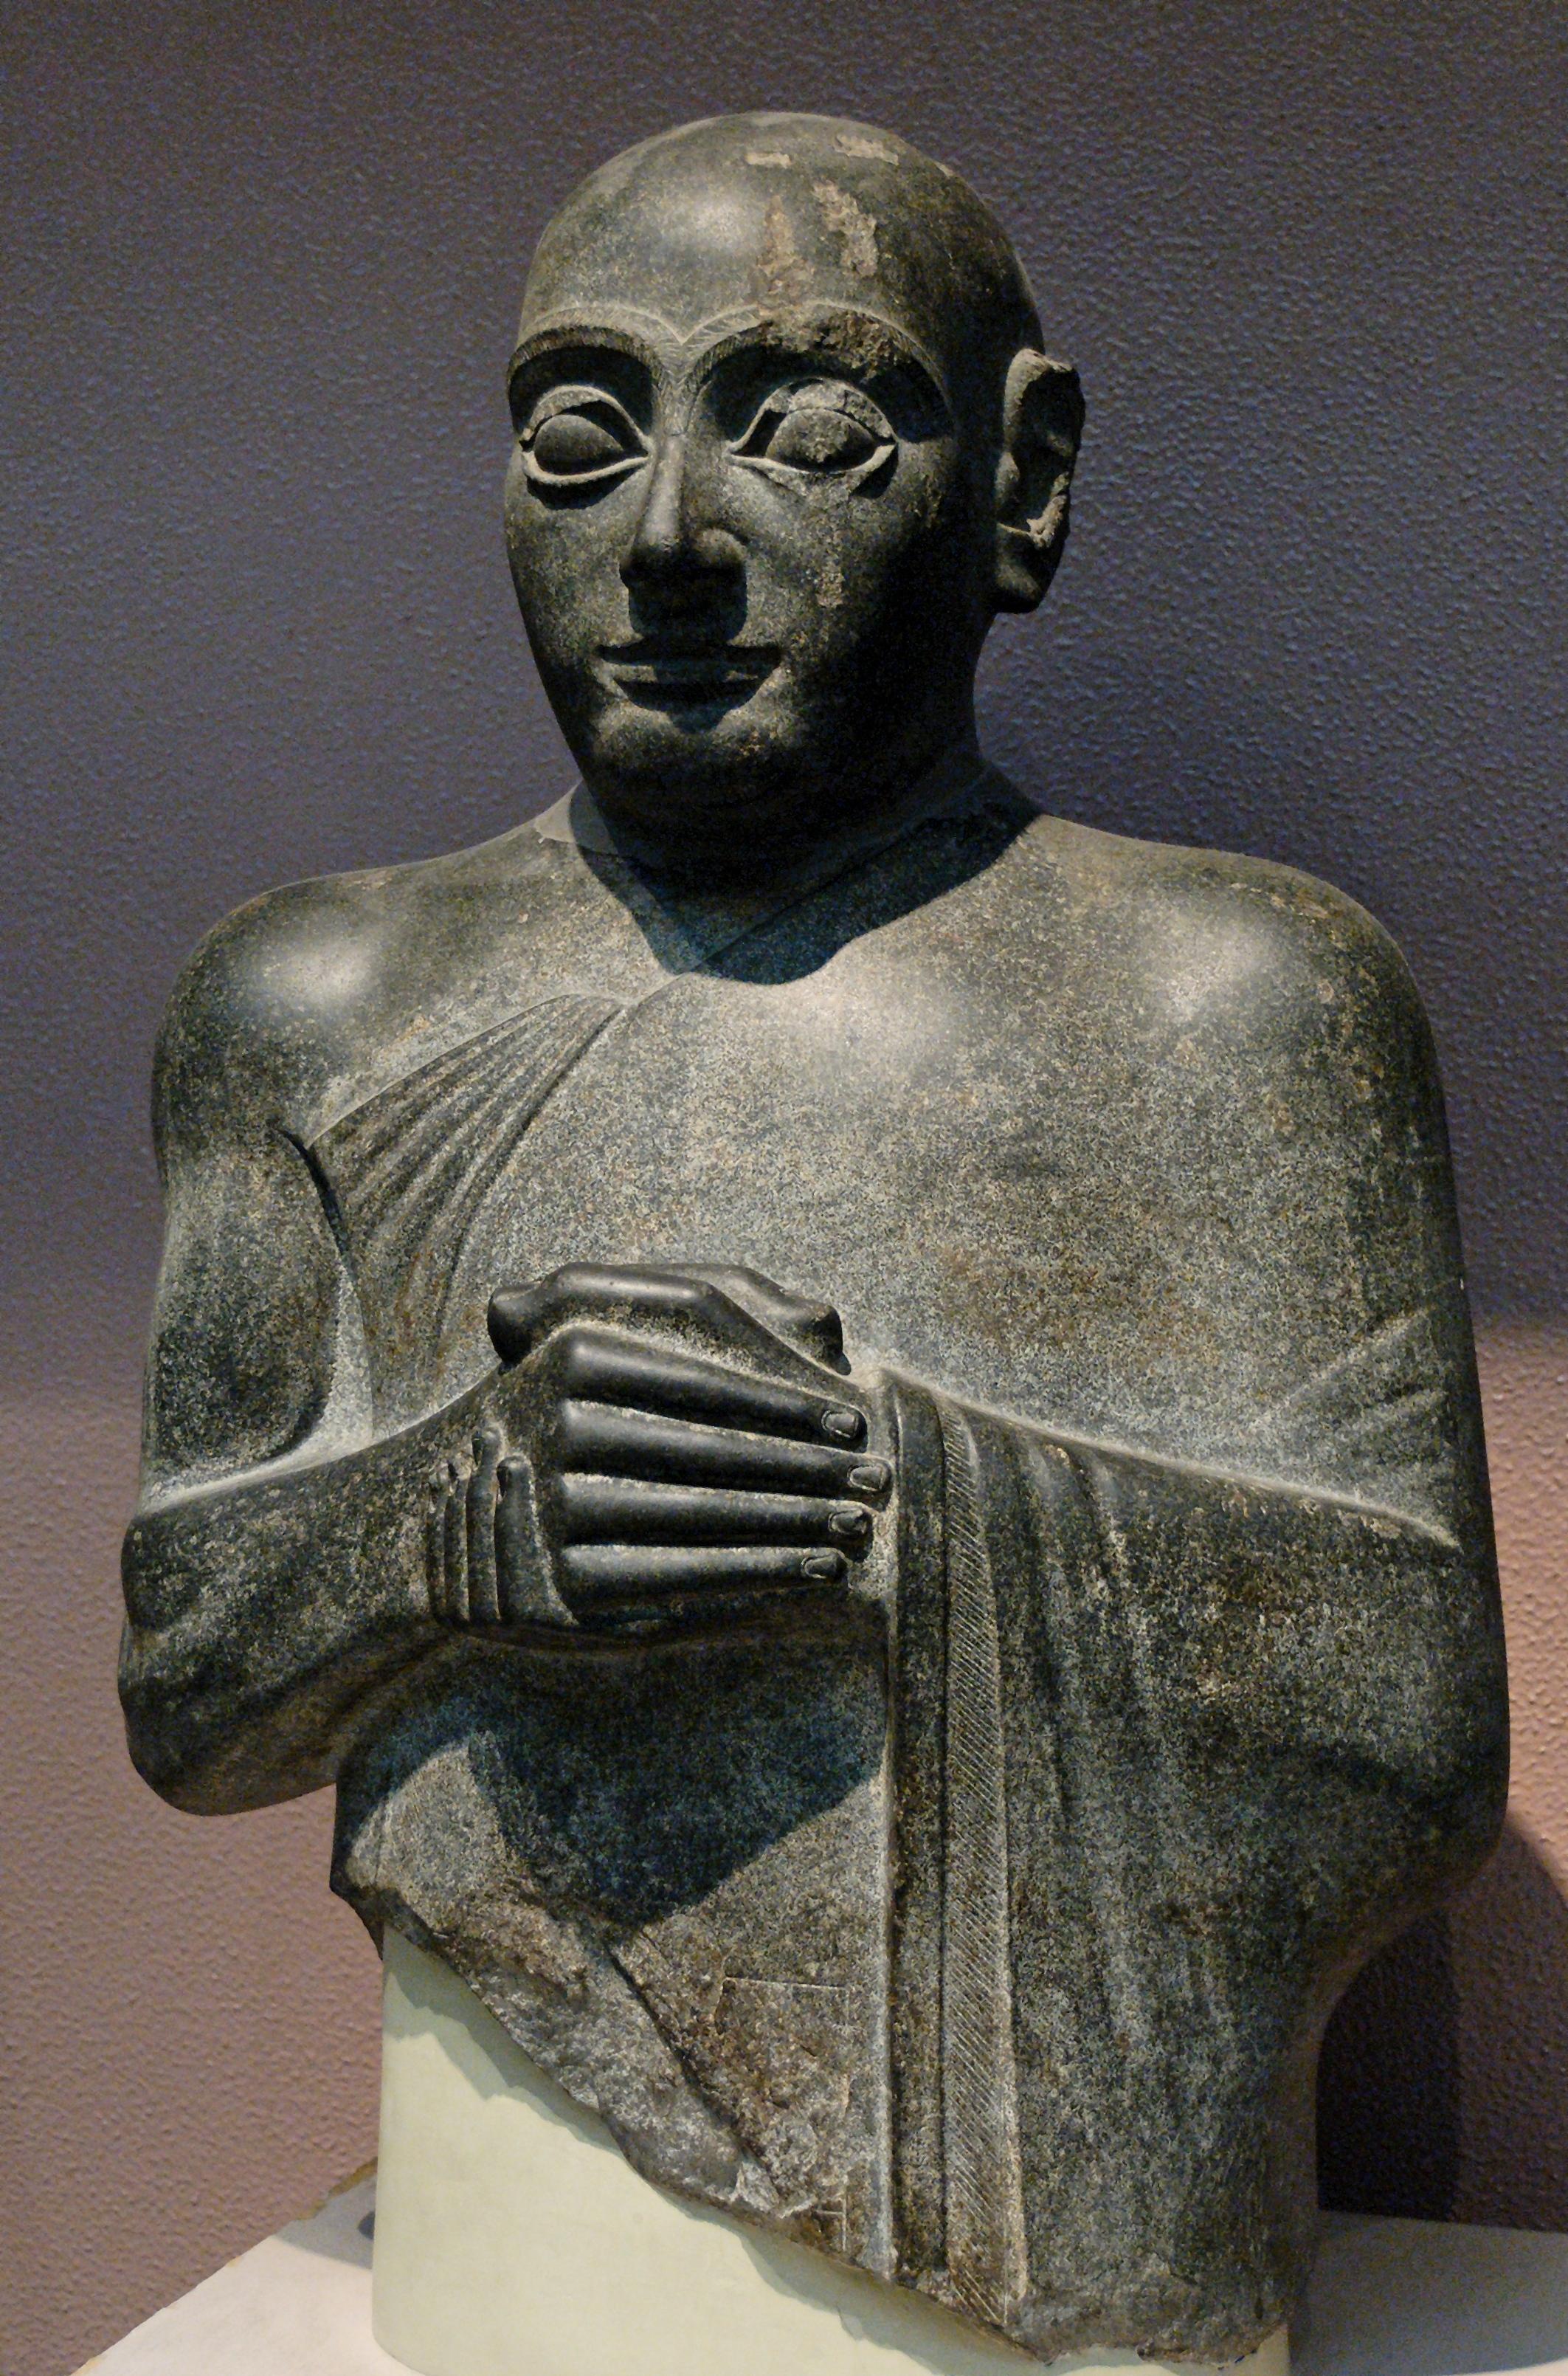 http://upload.wikimedia.org/wikipedia/commons/c/c7/Statue_Gudea_BM_WA122910.jpg